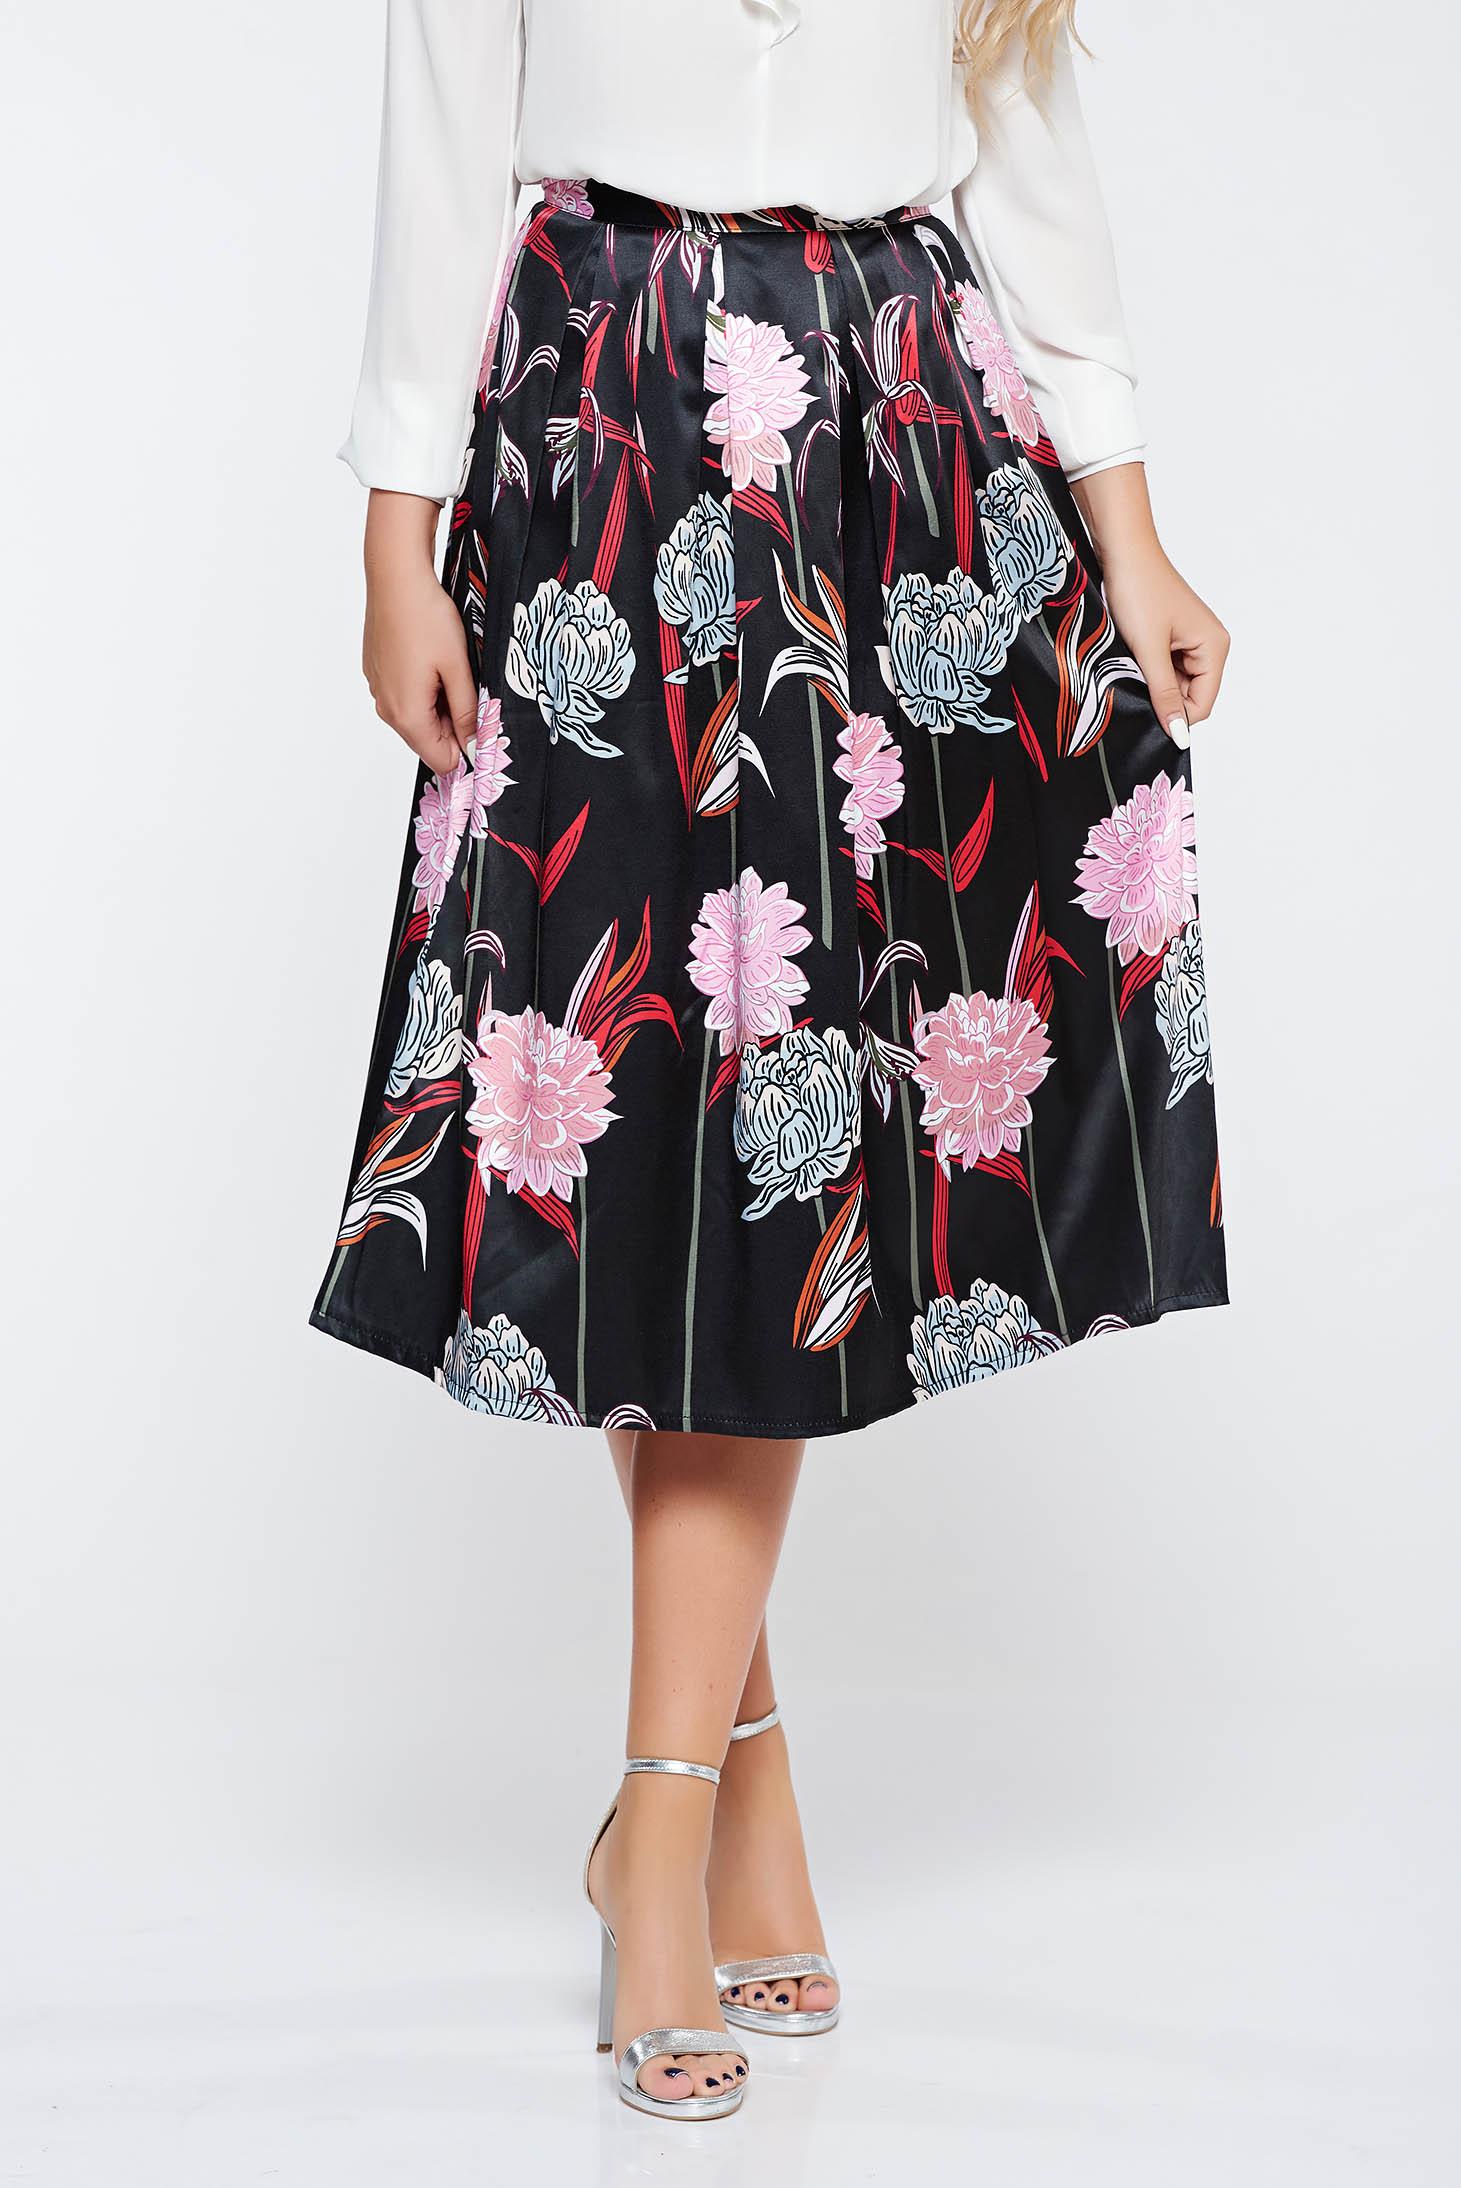 Sunshine Black Elegant Cloche Skirt High Waisted From Satin Fabric Petal Texture